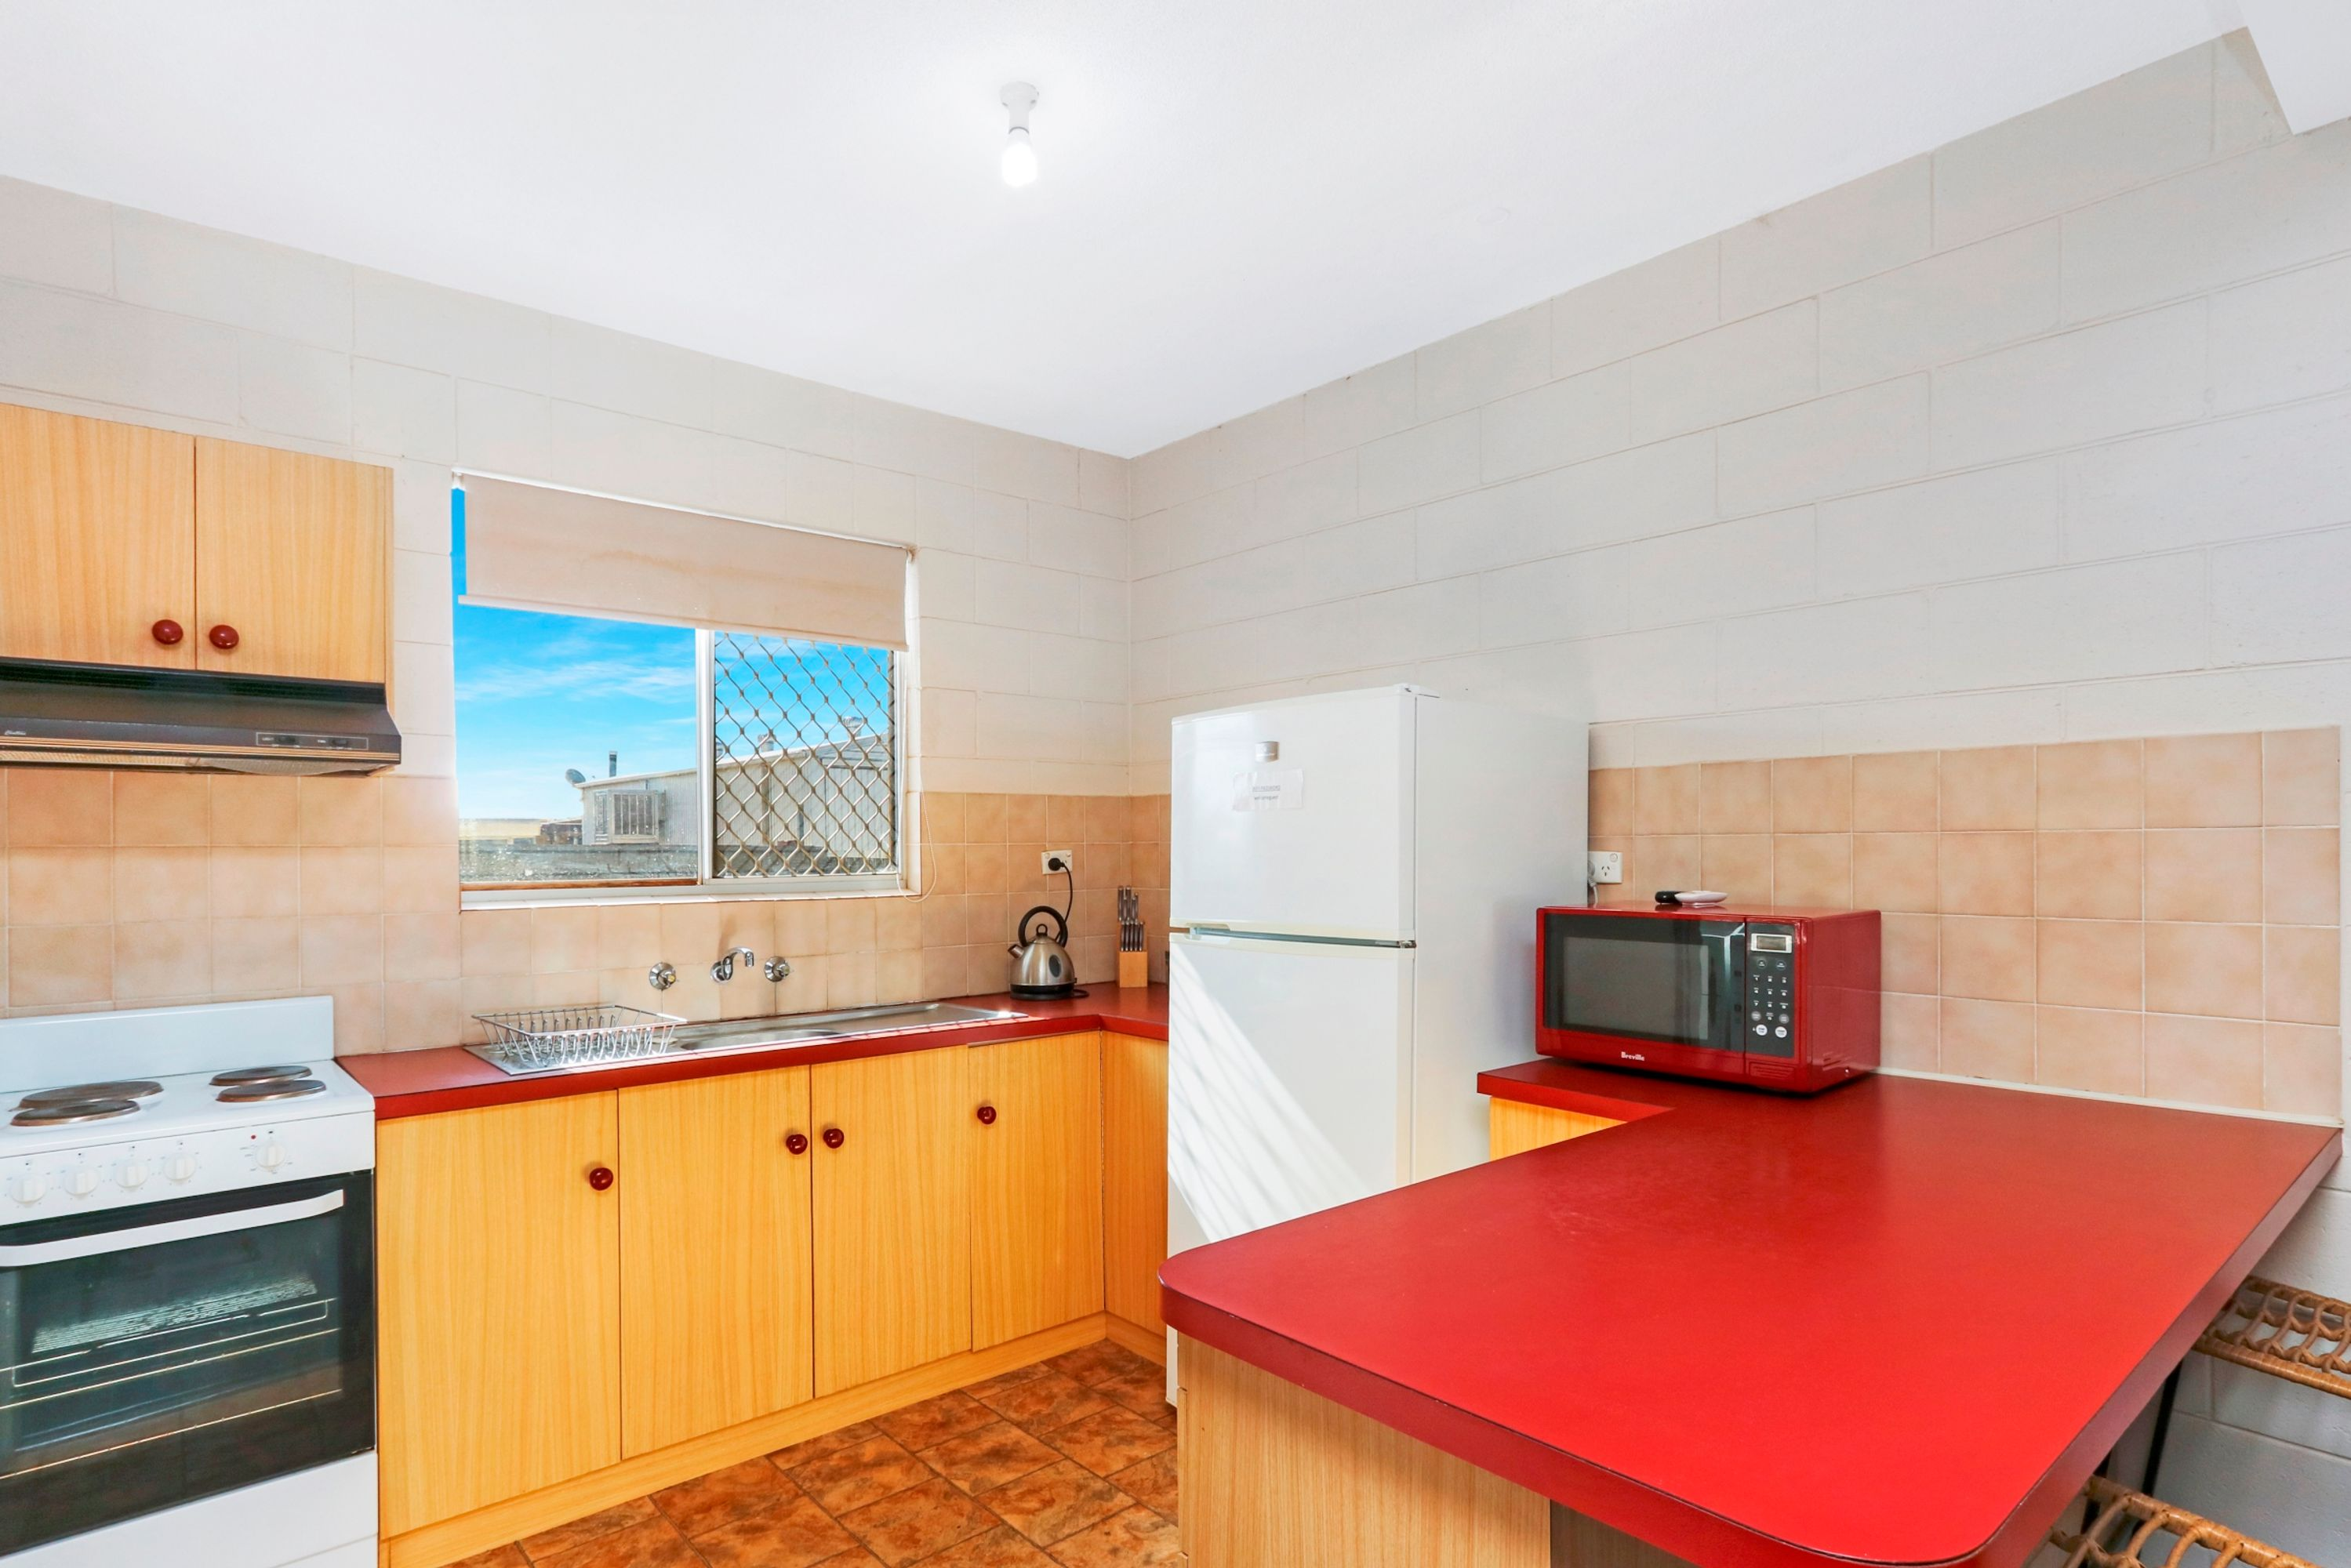 6/660 Blende Street, Broken Hill, NSW 2880